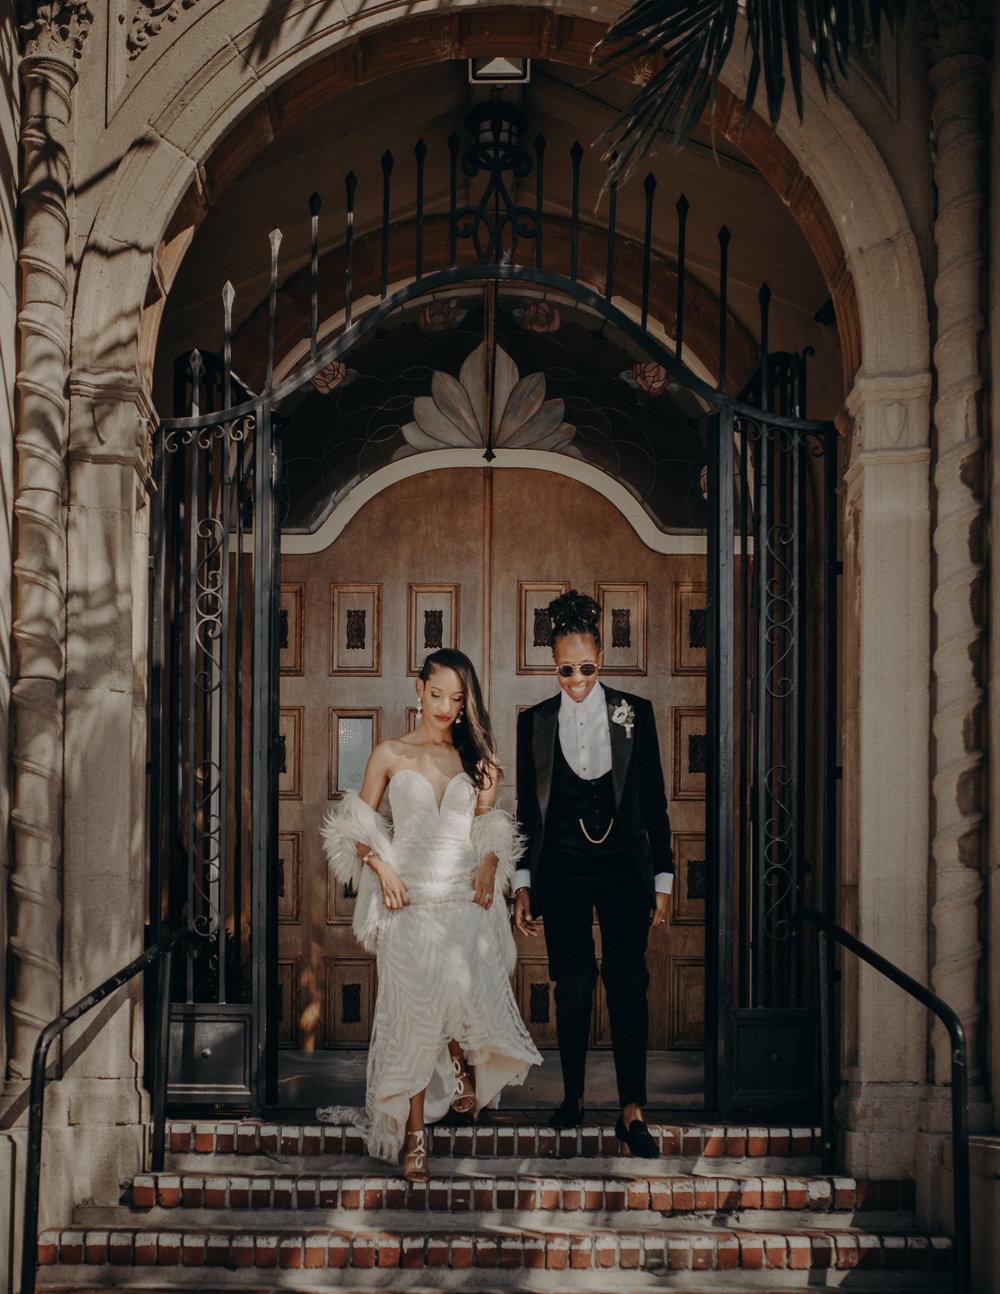 Wedding Photographer in Los Angeles - Ebell of Long Beach Wedding - LGBTQ weddings - lesbian wedding - IsaiahAndTaylor.com-043.jpg